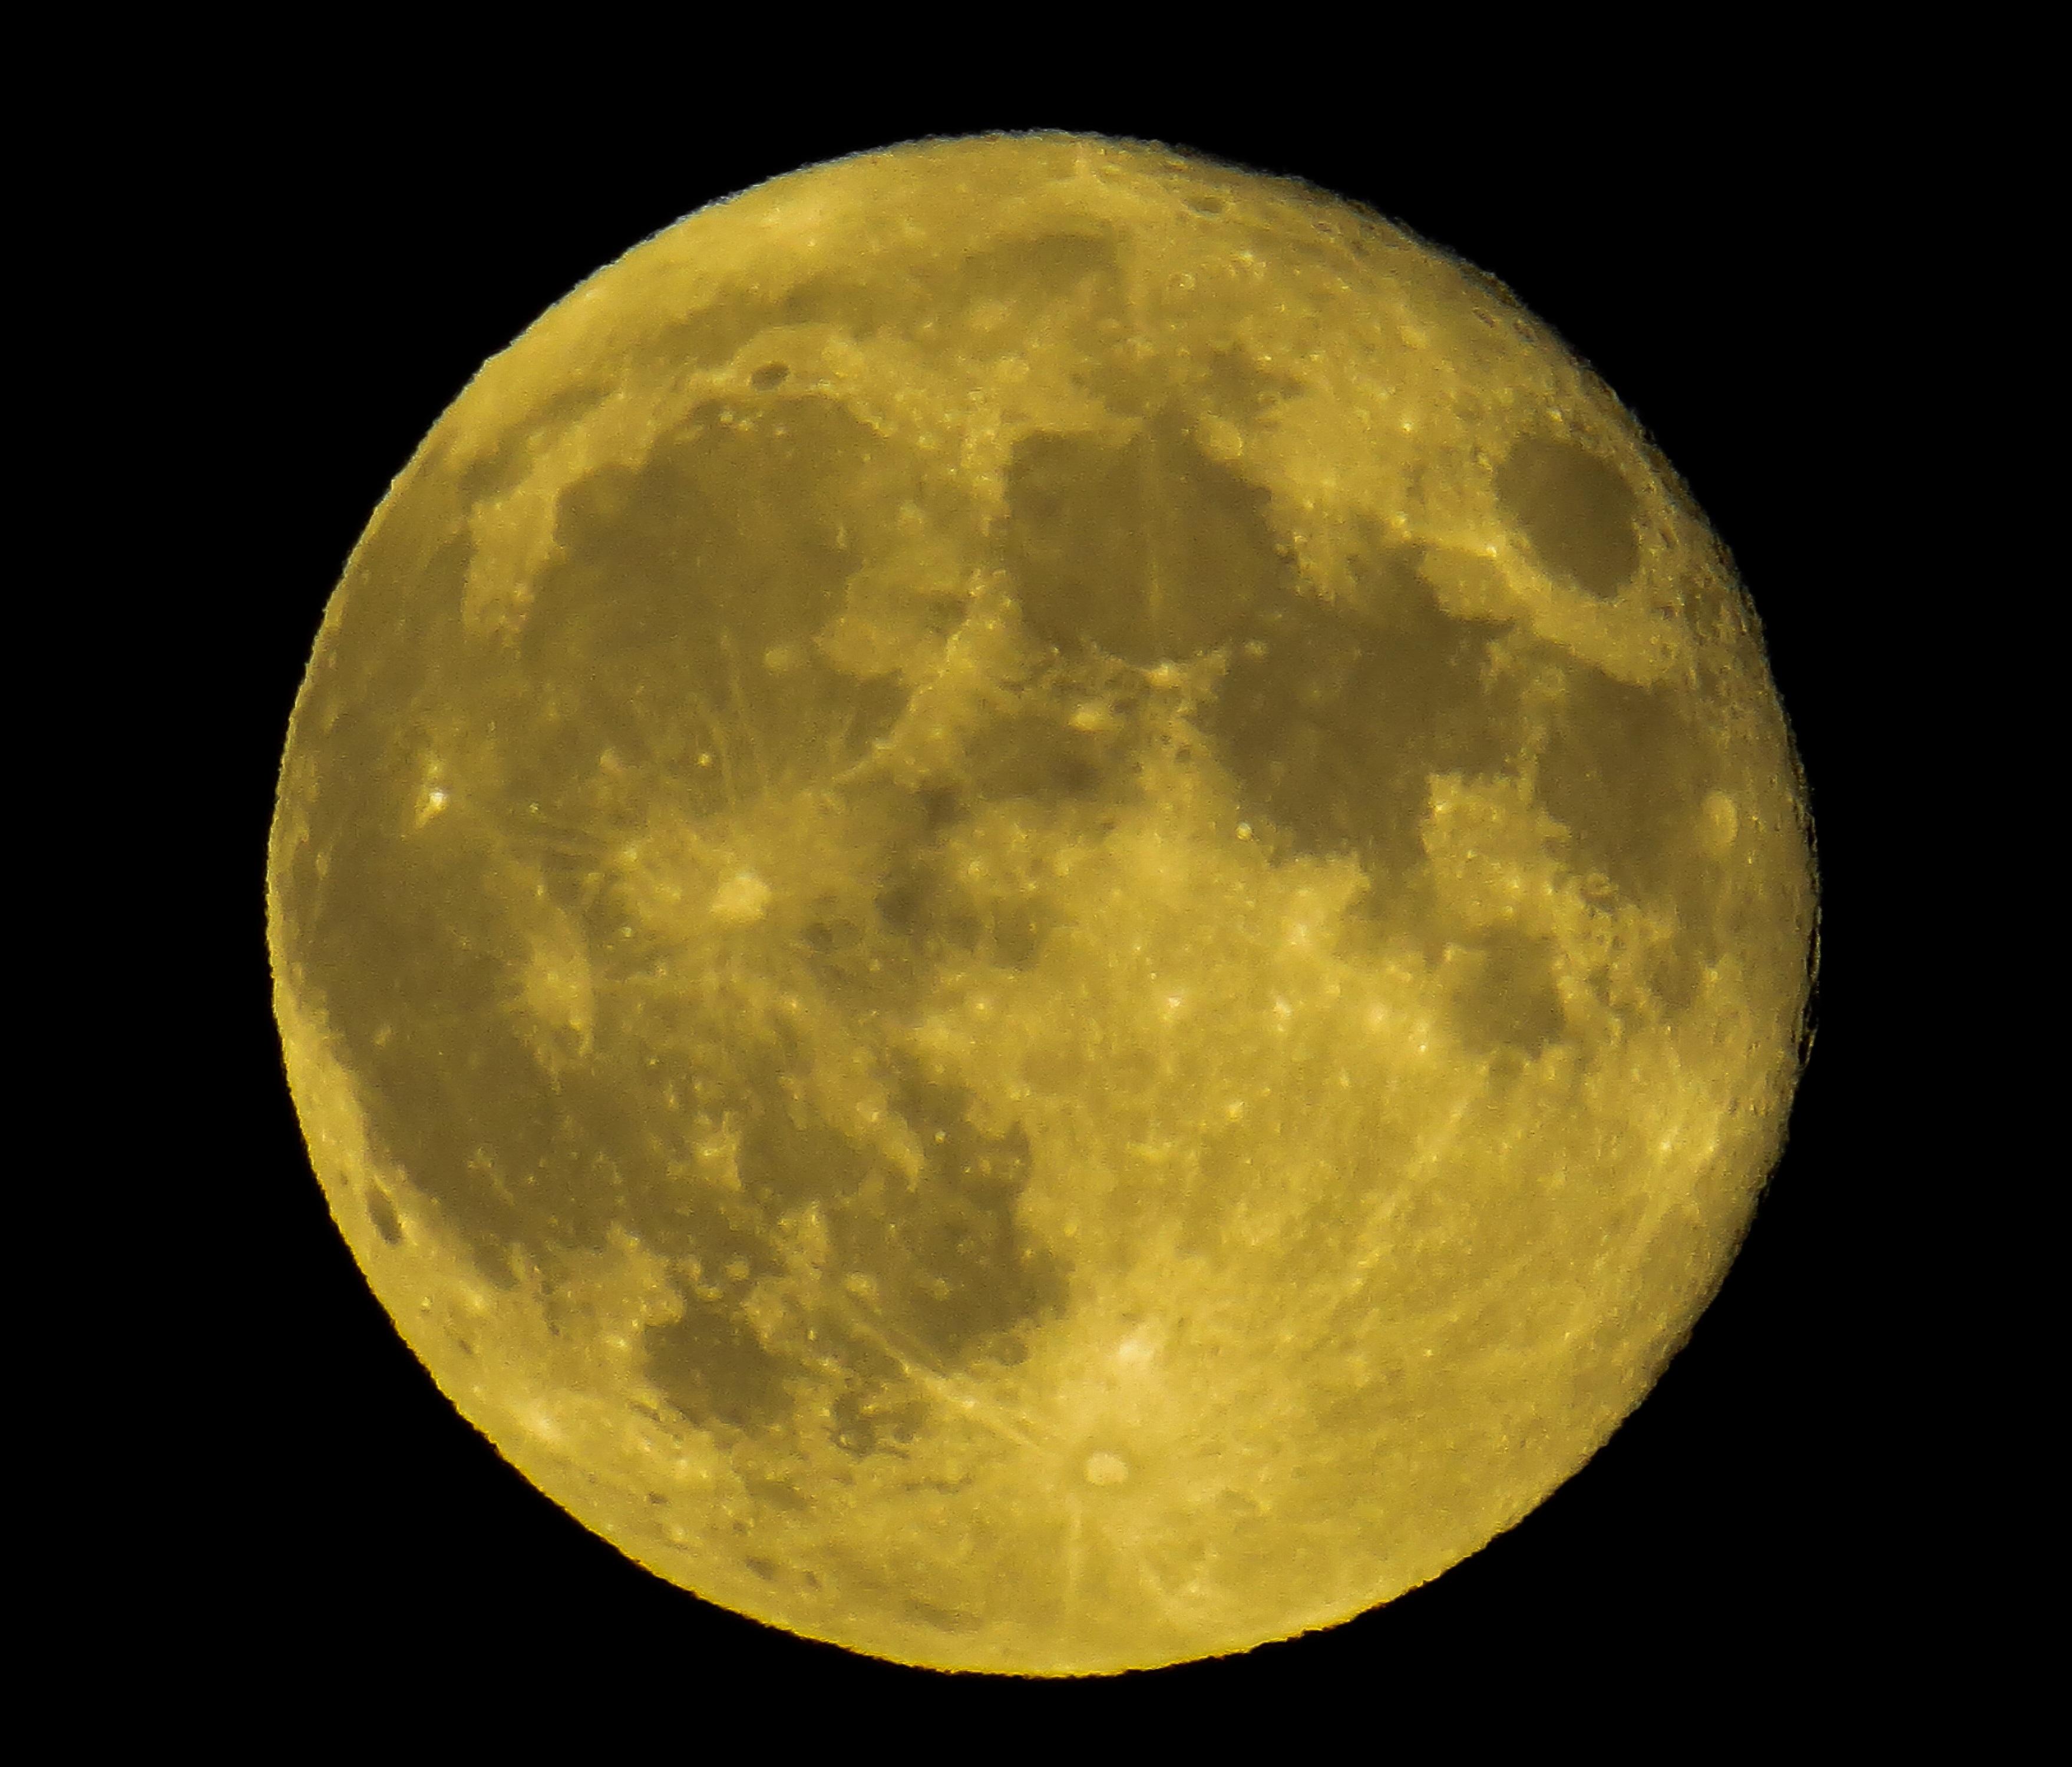 Full Moon, Circle, Full, Gravity, Lunar, HQ Photo